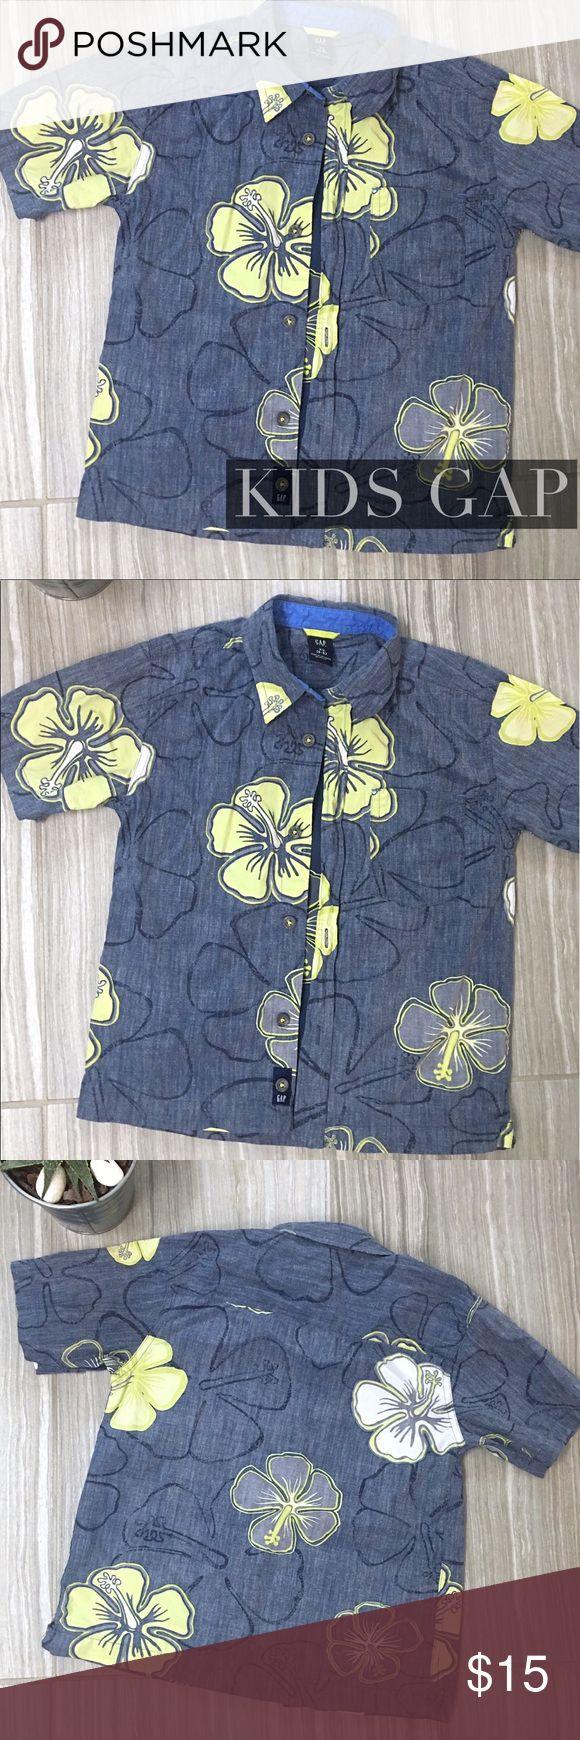 Gap Boys Hawaiian shirt size XS 4-5 Gap boys cotton Button Down Hawaiian print shirt. Size XS (4-5). EUC GAP Shirts & Tops Button Down Shirts